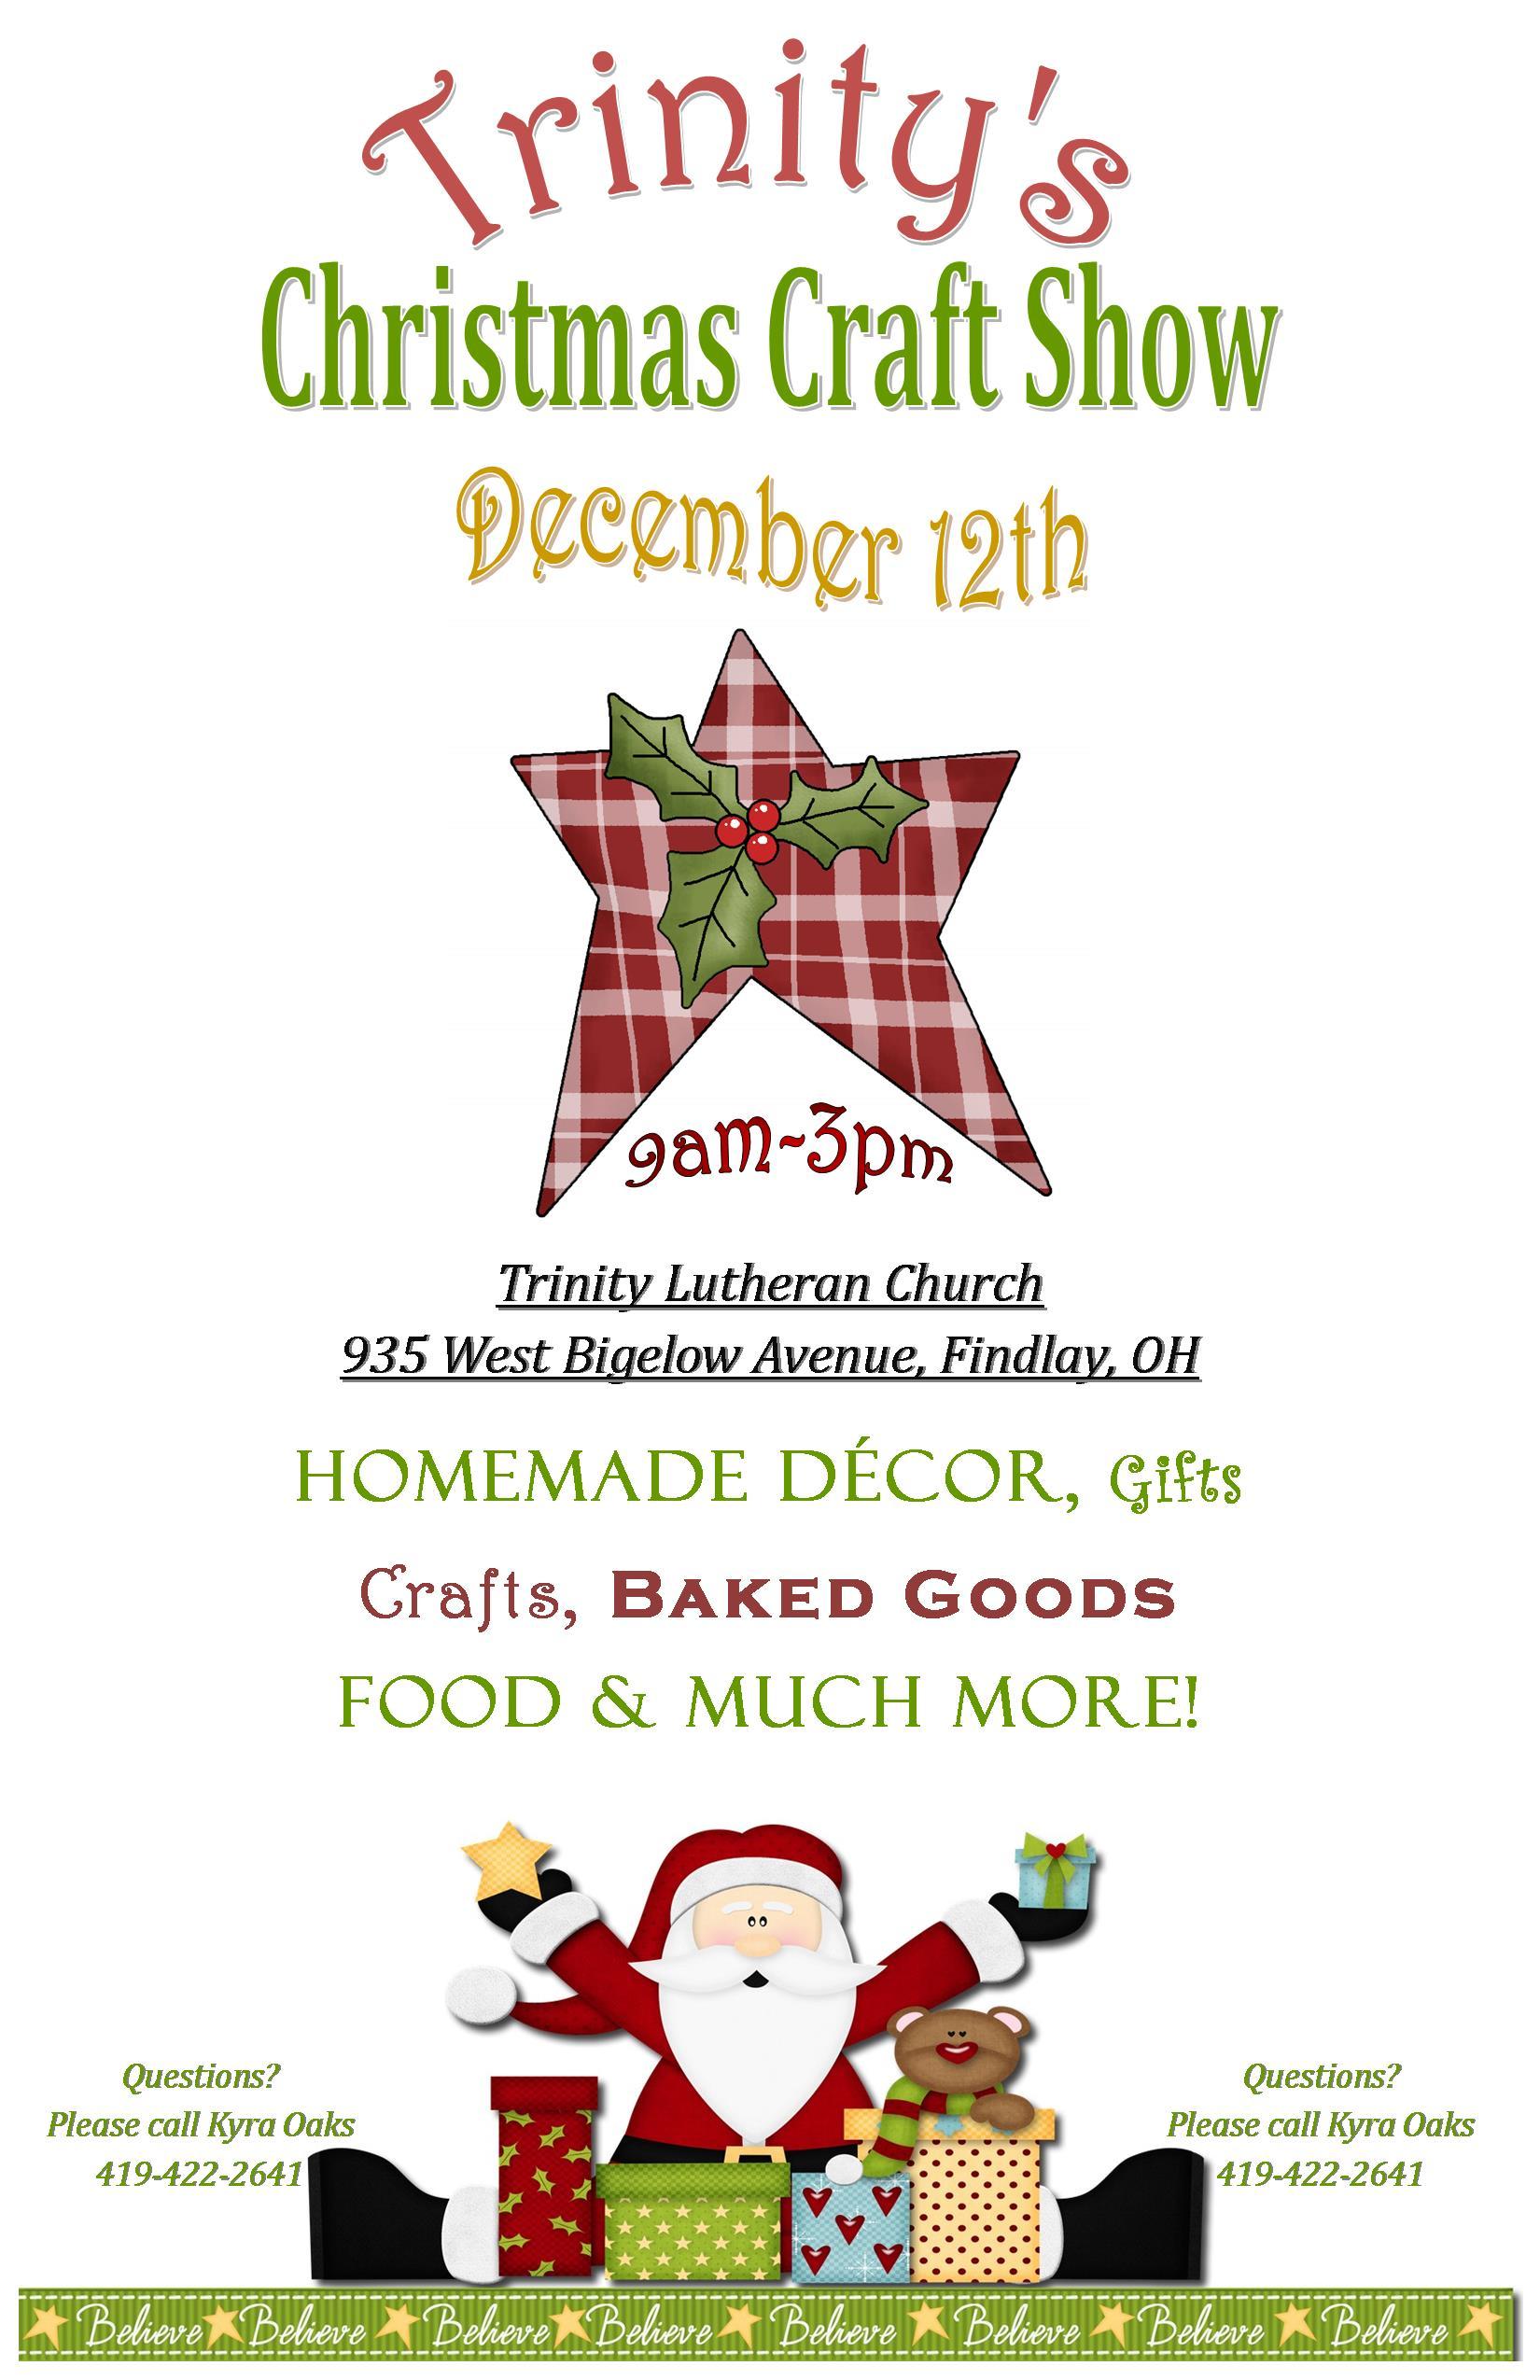 Trinity's Christmas Craft Show @ Trinity Lutheran Church | Findlay | Ohio | United States